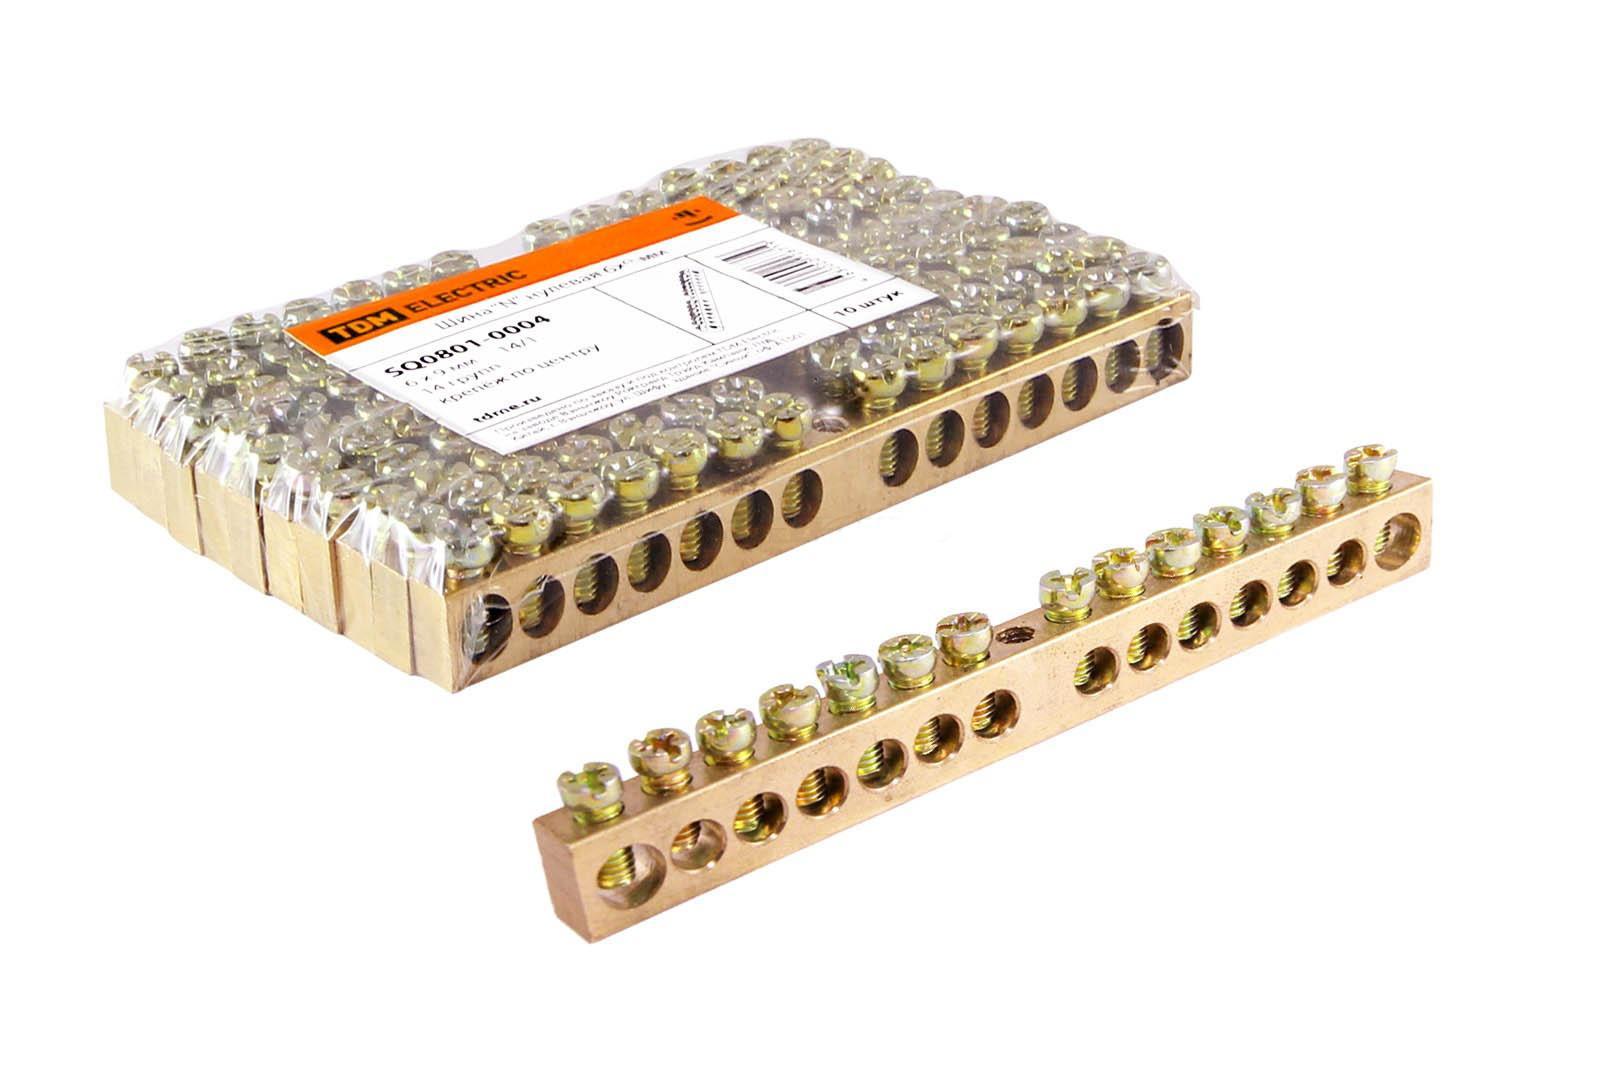 Шина Tdm Sq0801-0004 электронный трансформатор tdm тэ 200 sq0360 0004